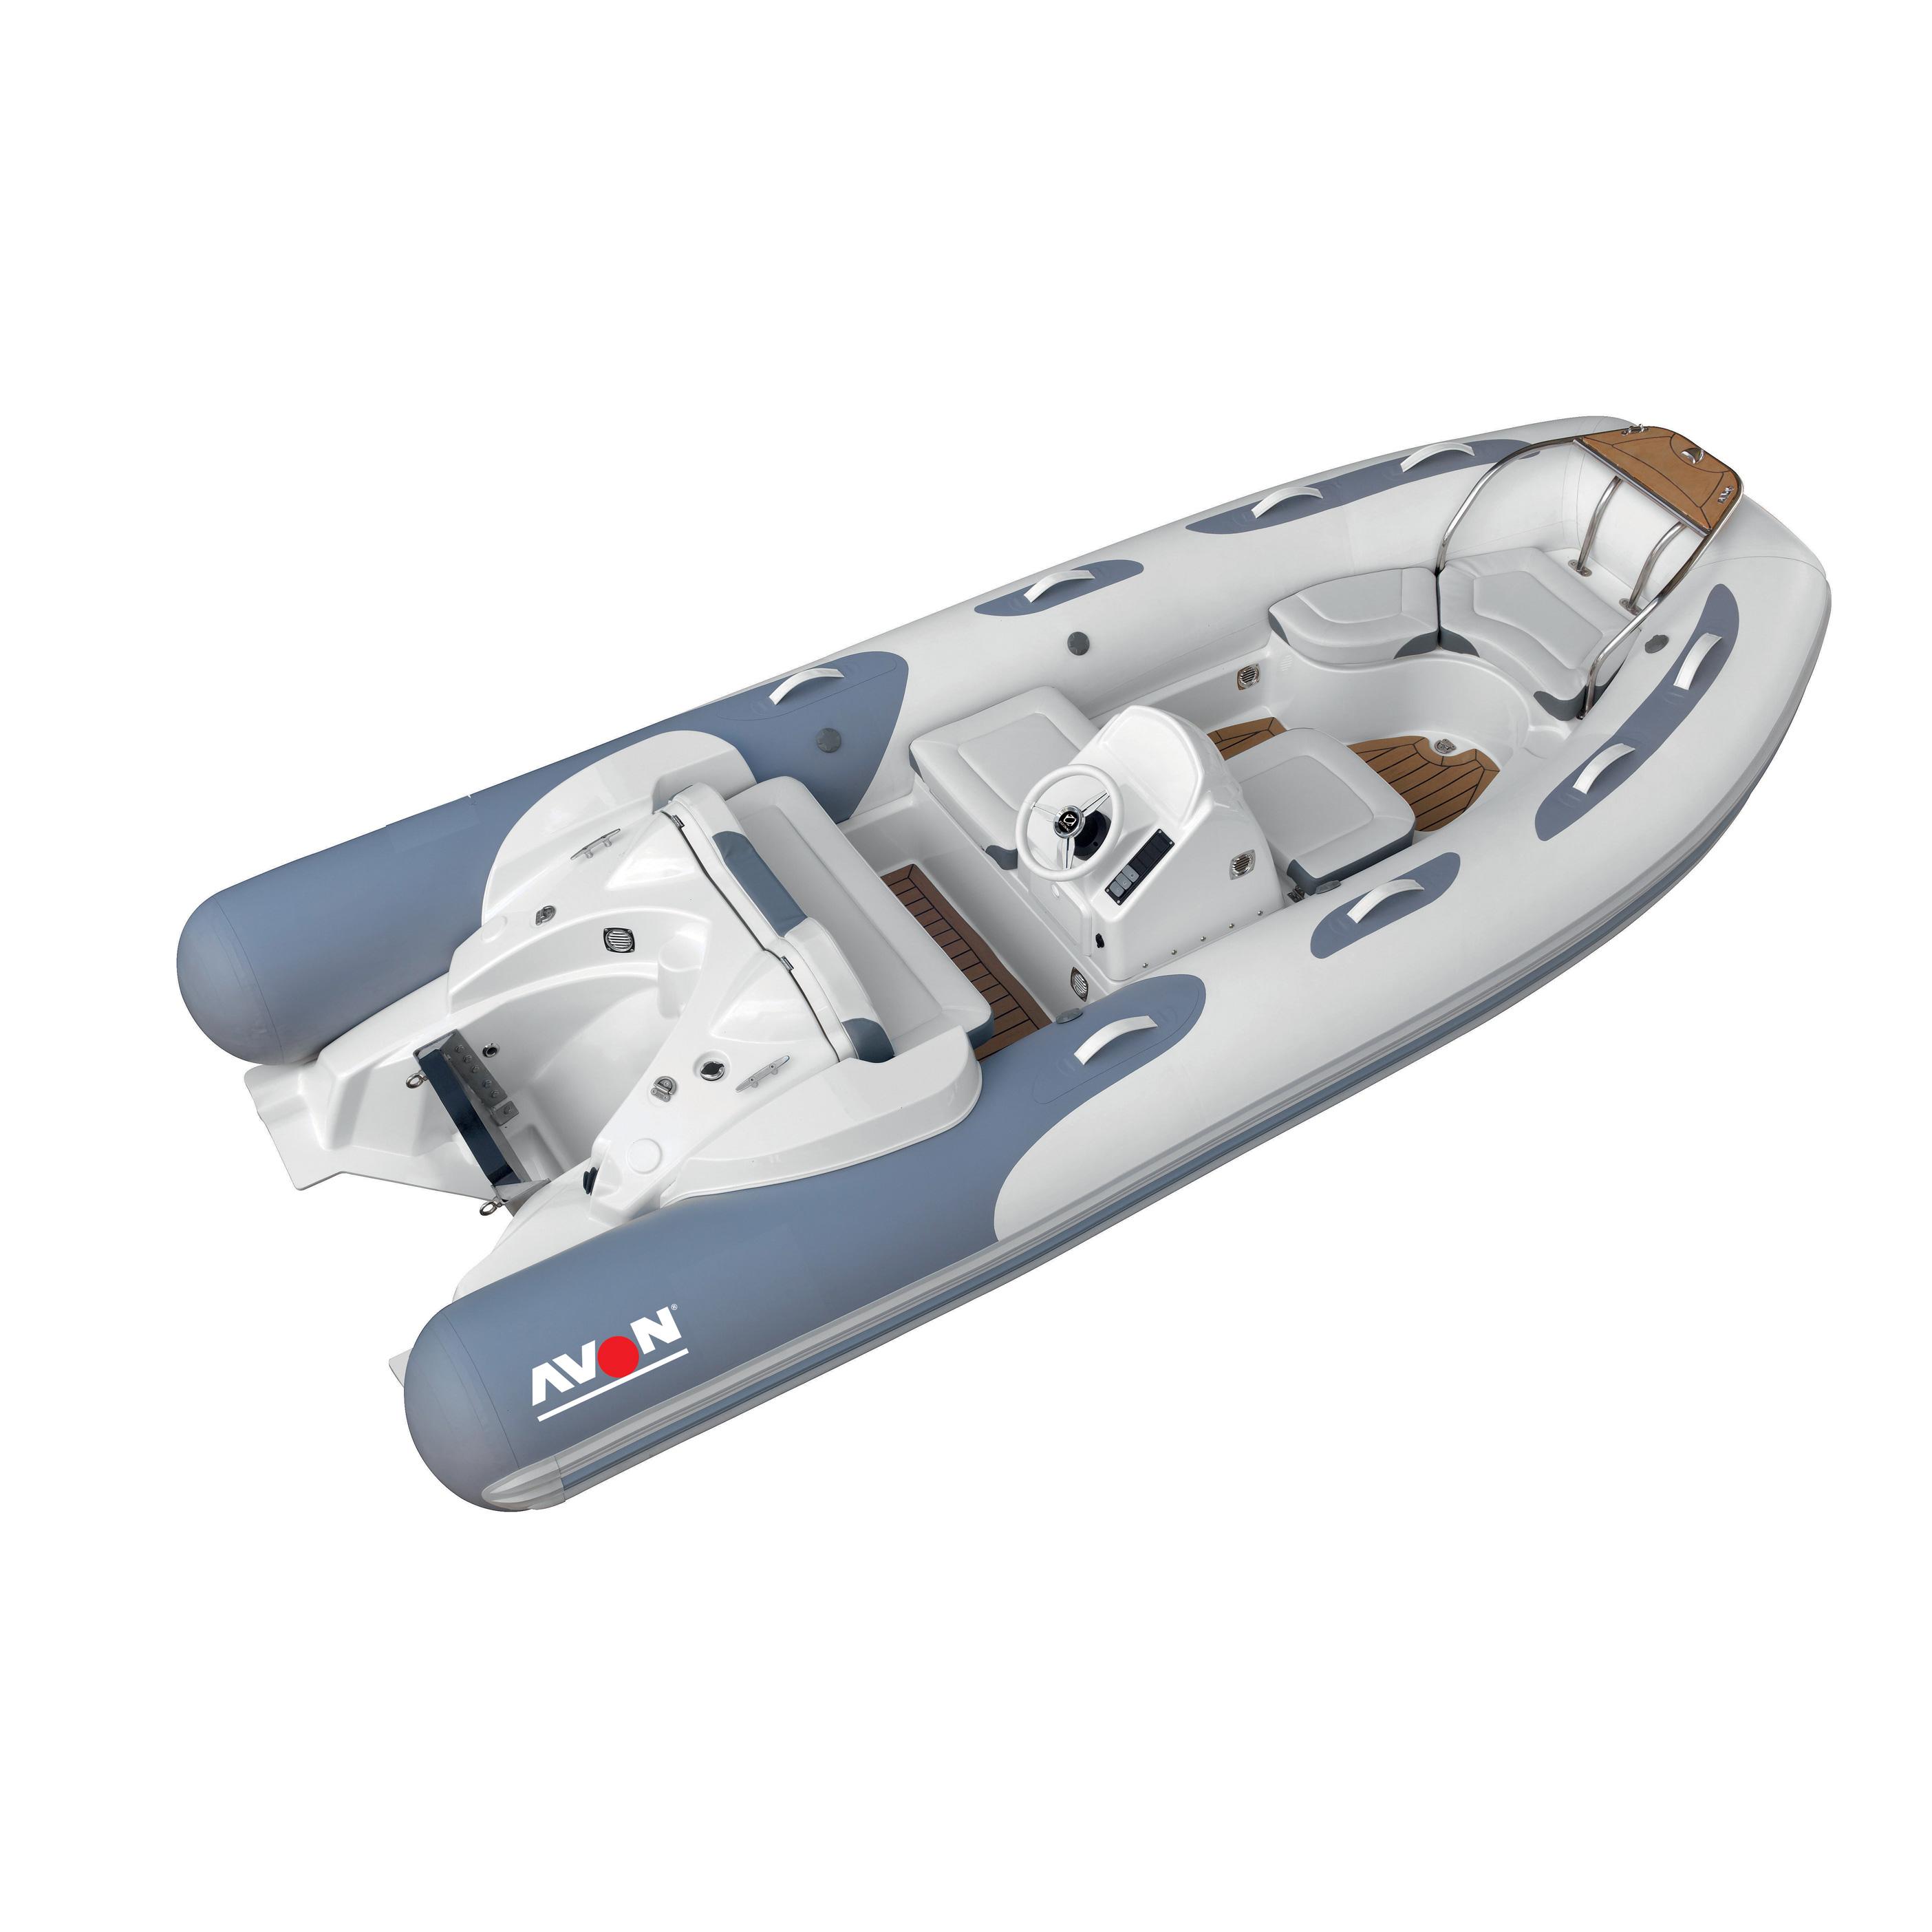 Avon's outboard-powered Seasport line is tremendous fun